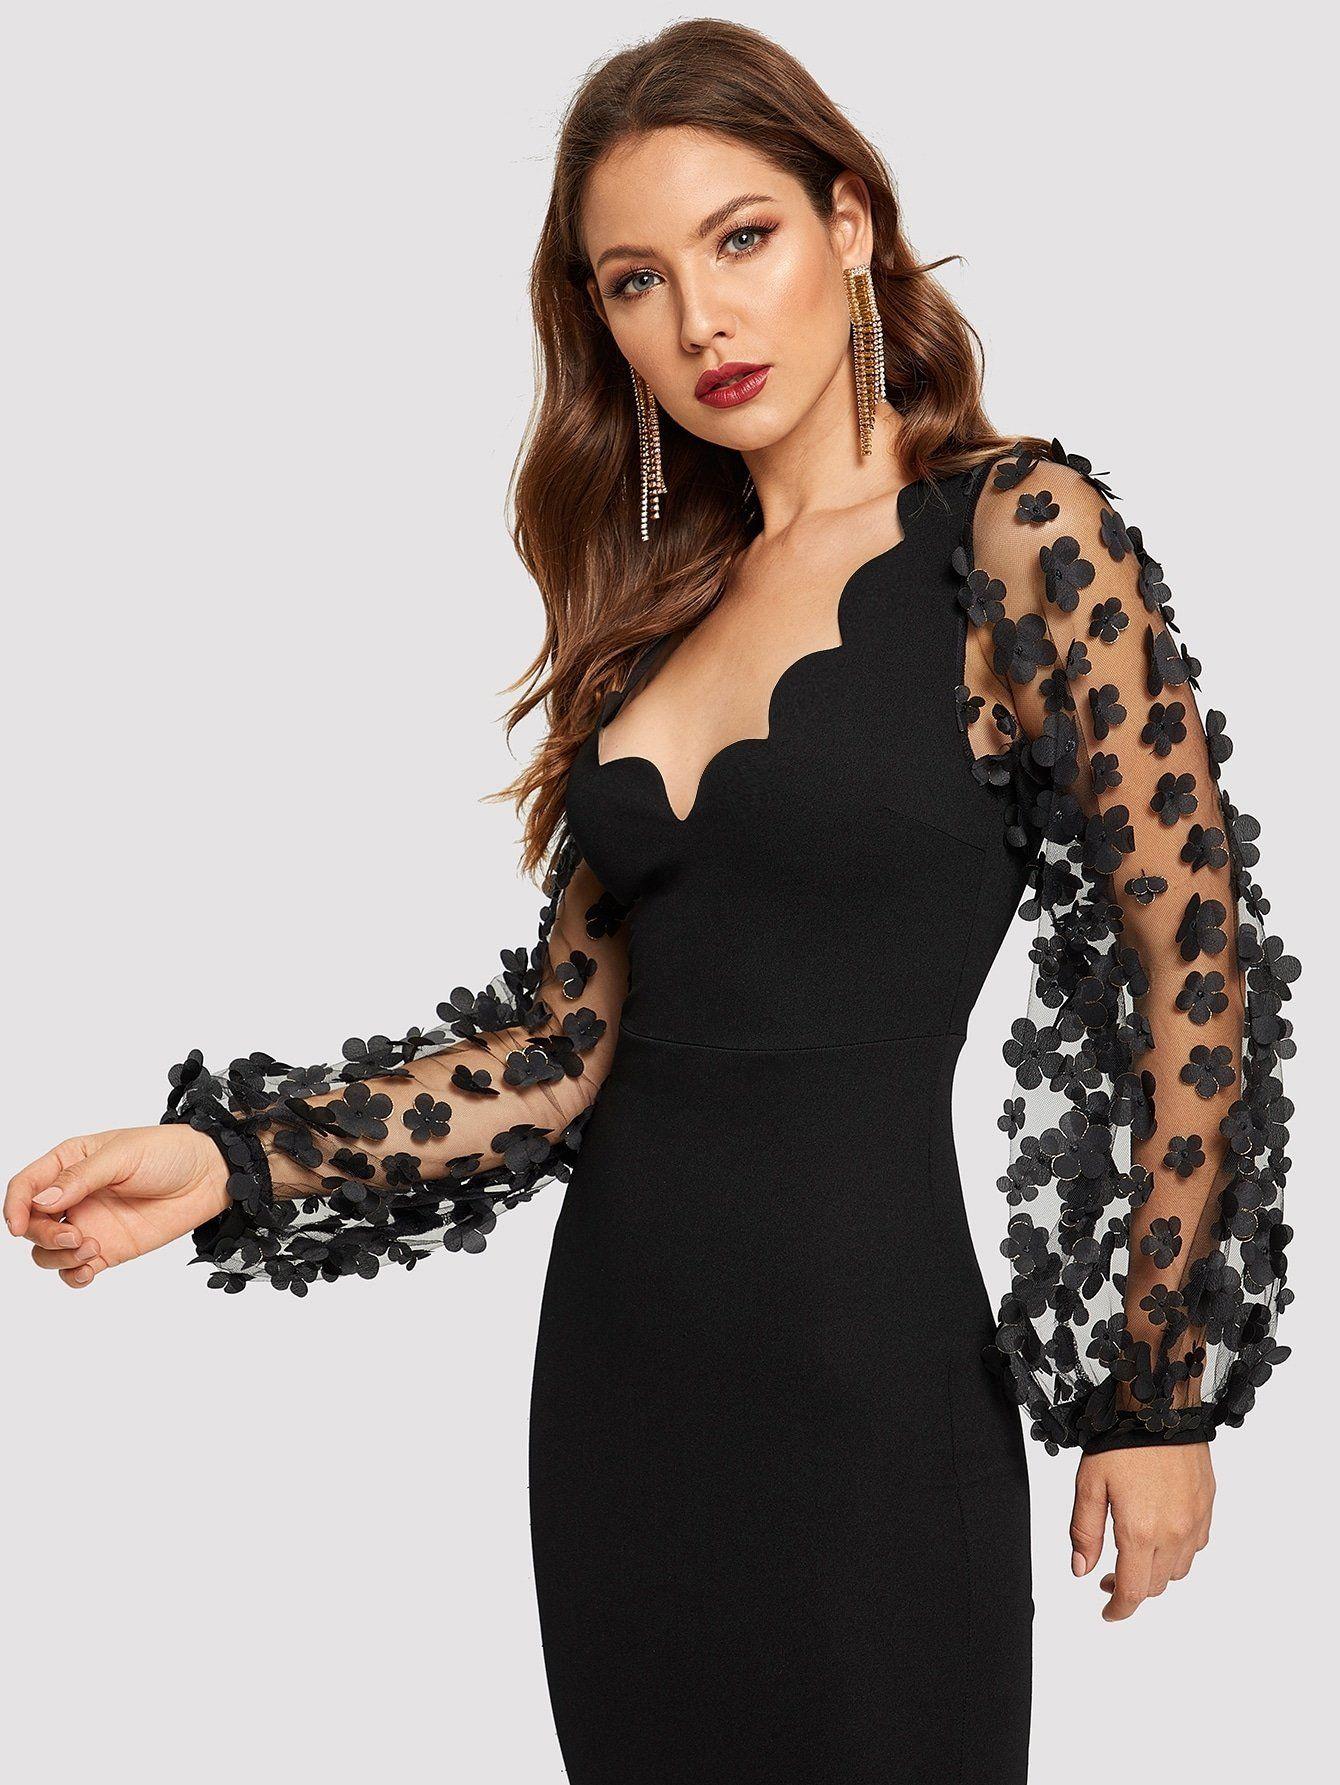 3d Applique Mesh Sleeve Scallop Edge Dress Black Dresses Classy Dress Clothes For Women Dresses [ 1785 x 1340 Pixel ]